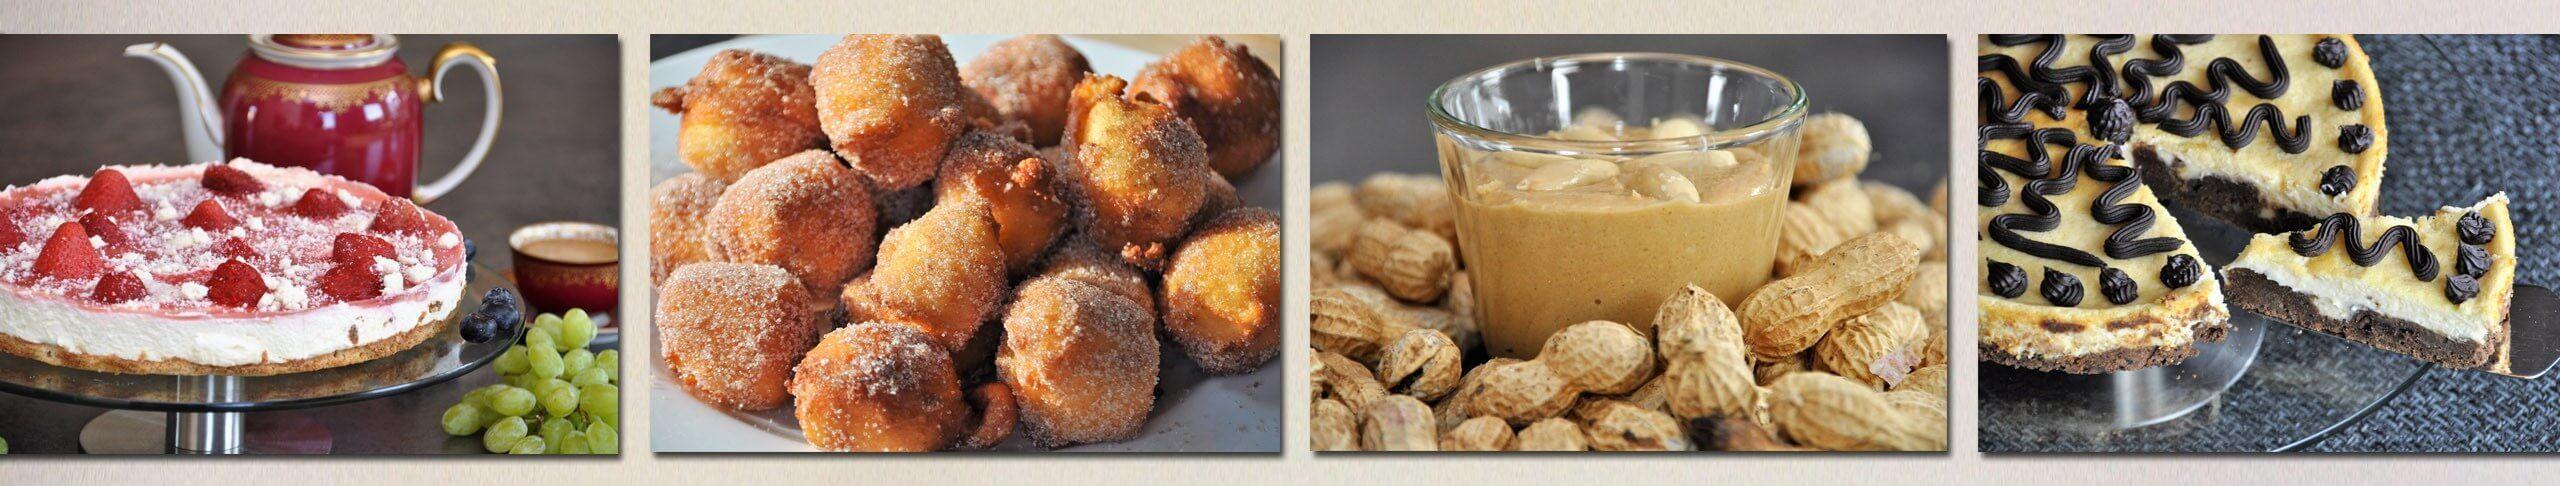 Staupitopia Zuckerfrei, Low Carb Rezepte, Rezepte ohne Zucker, Rezepte ohne Kohlenhydrate